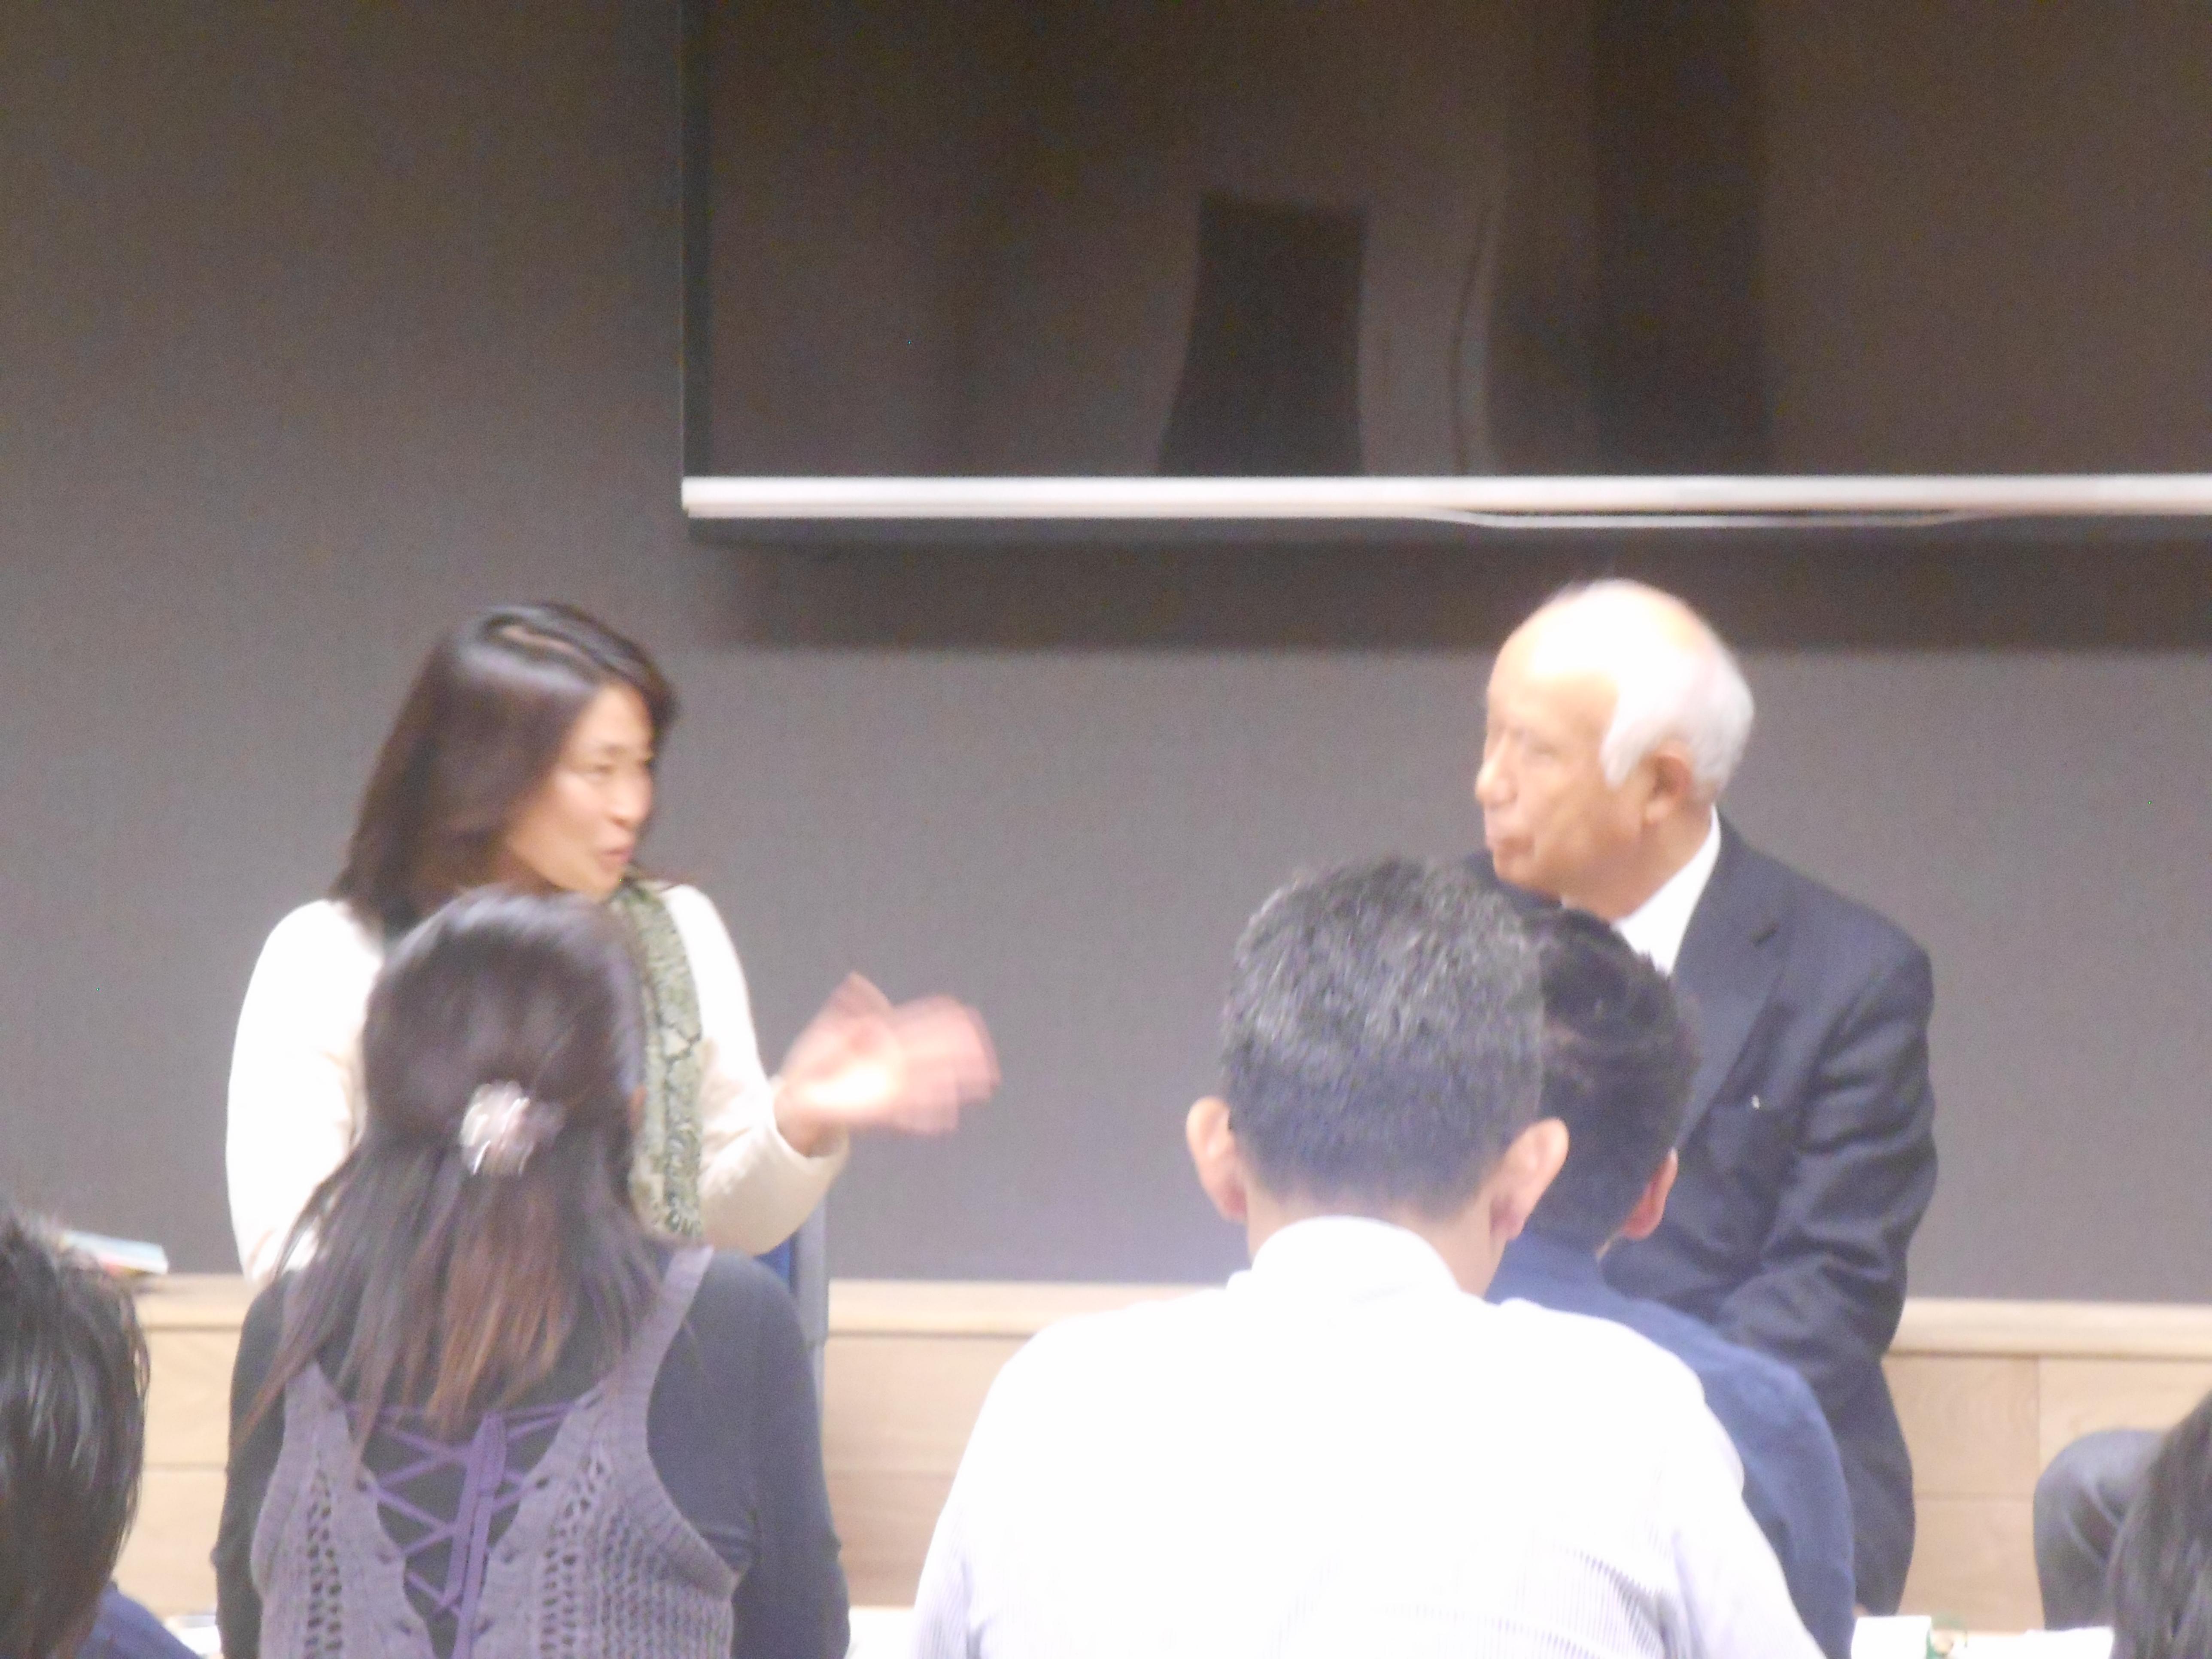 DSCN0483 1 - 平成30年度 東京思風塾 4月7日(土)「時代が問題をつくり、問題が人物をつくる」